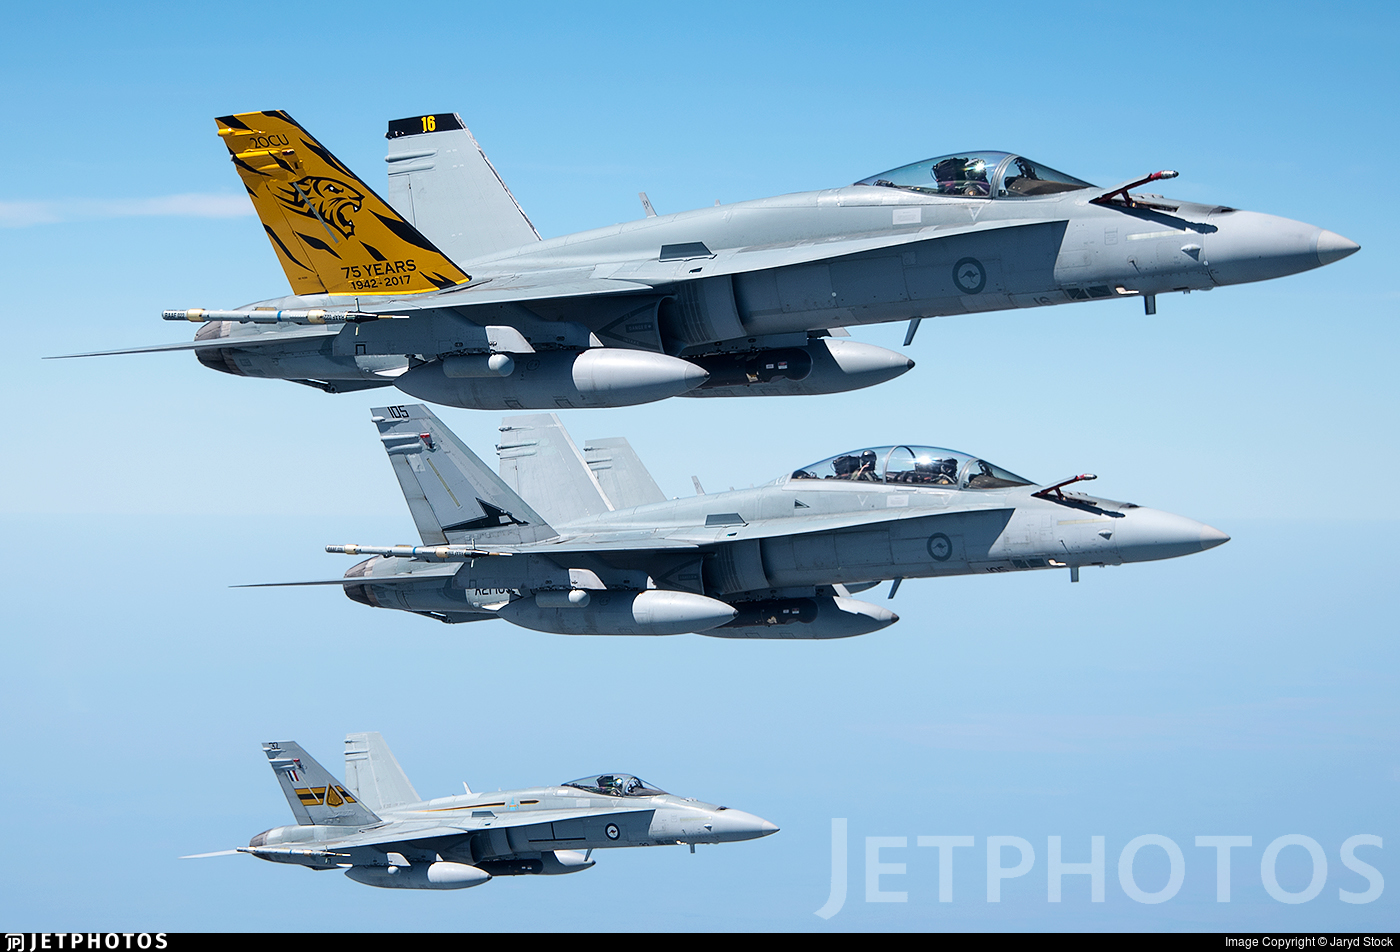 A21-16 - McDonnell Douglas F/A-18A Hornet - Australia - Royal Australian Air Force (RAAF)